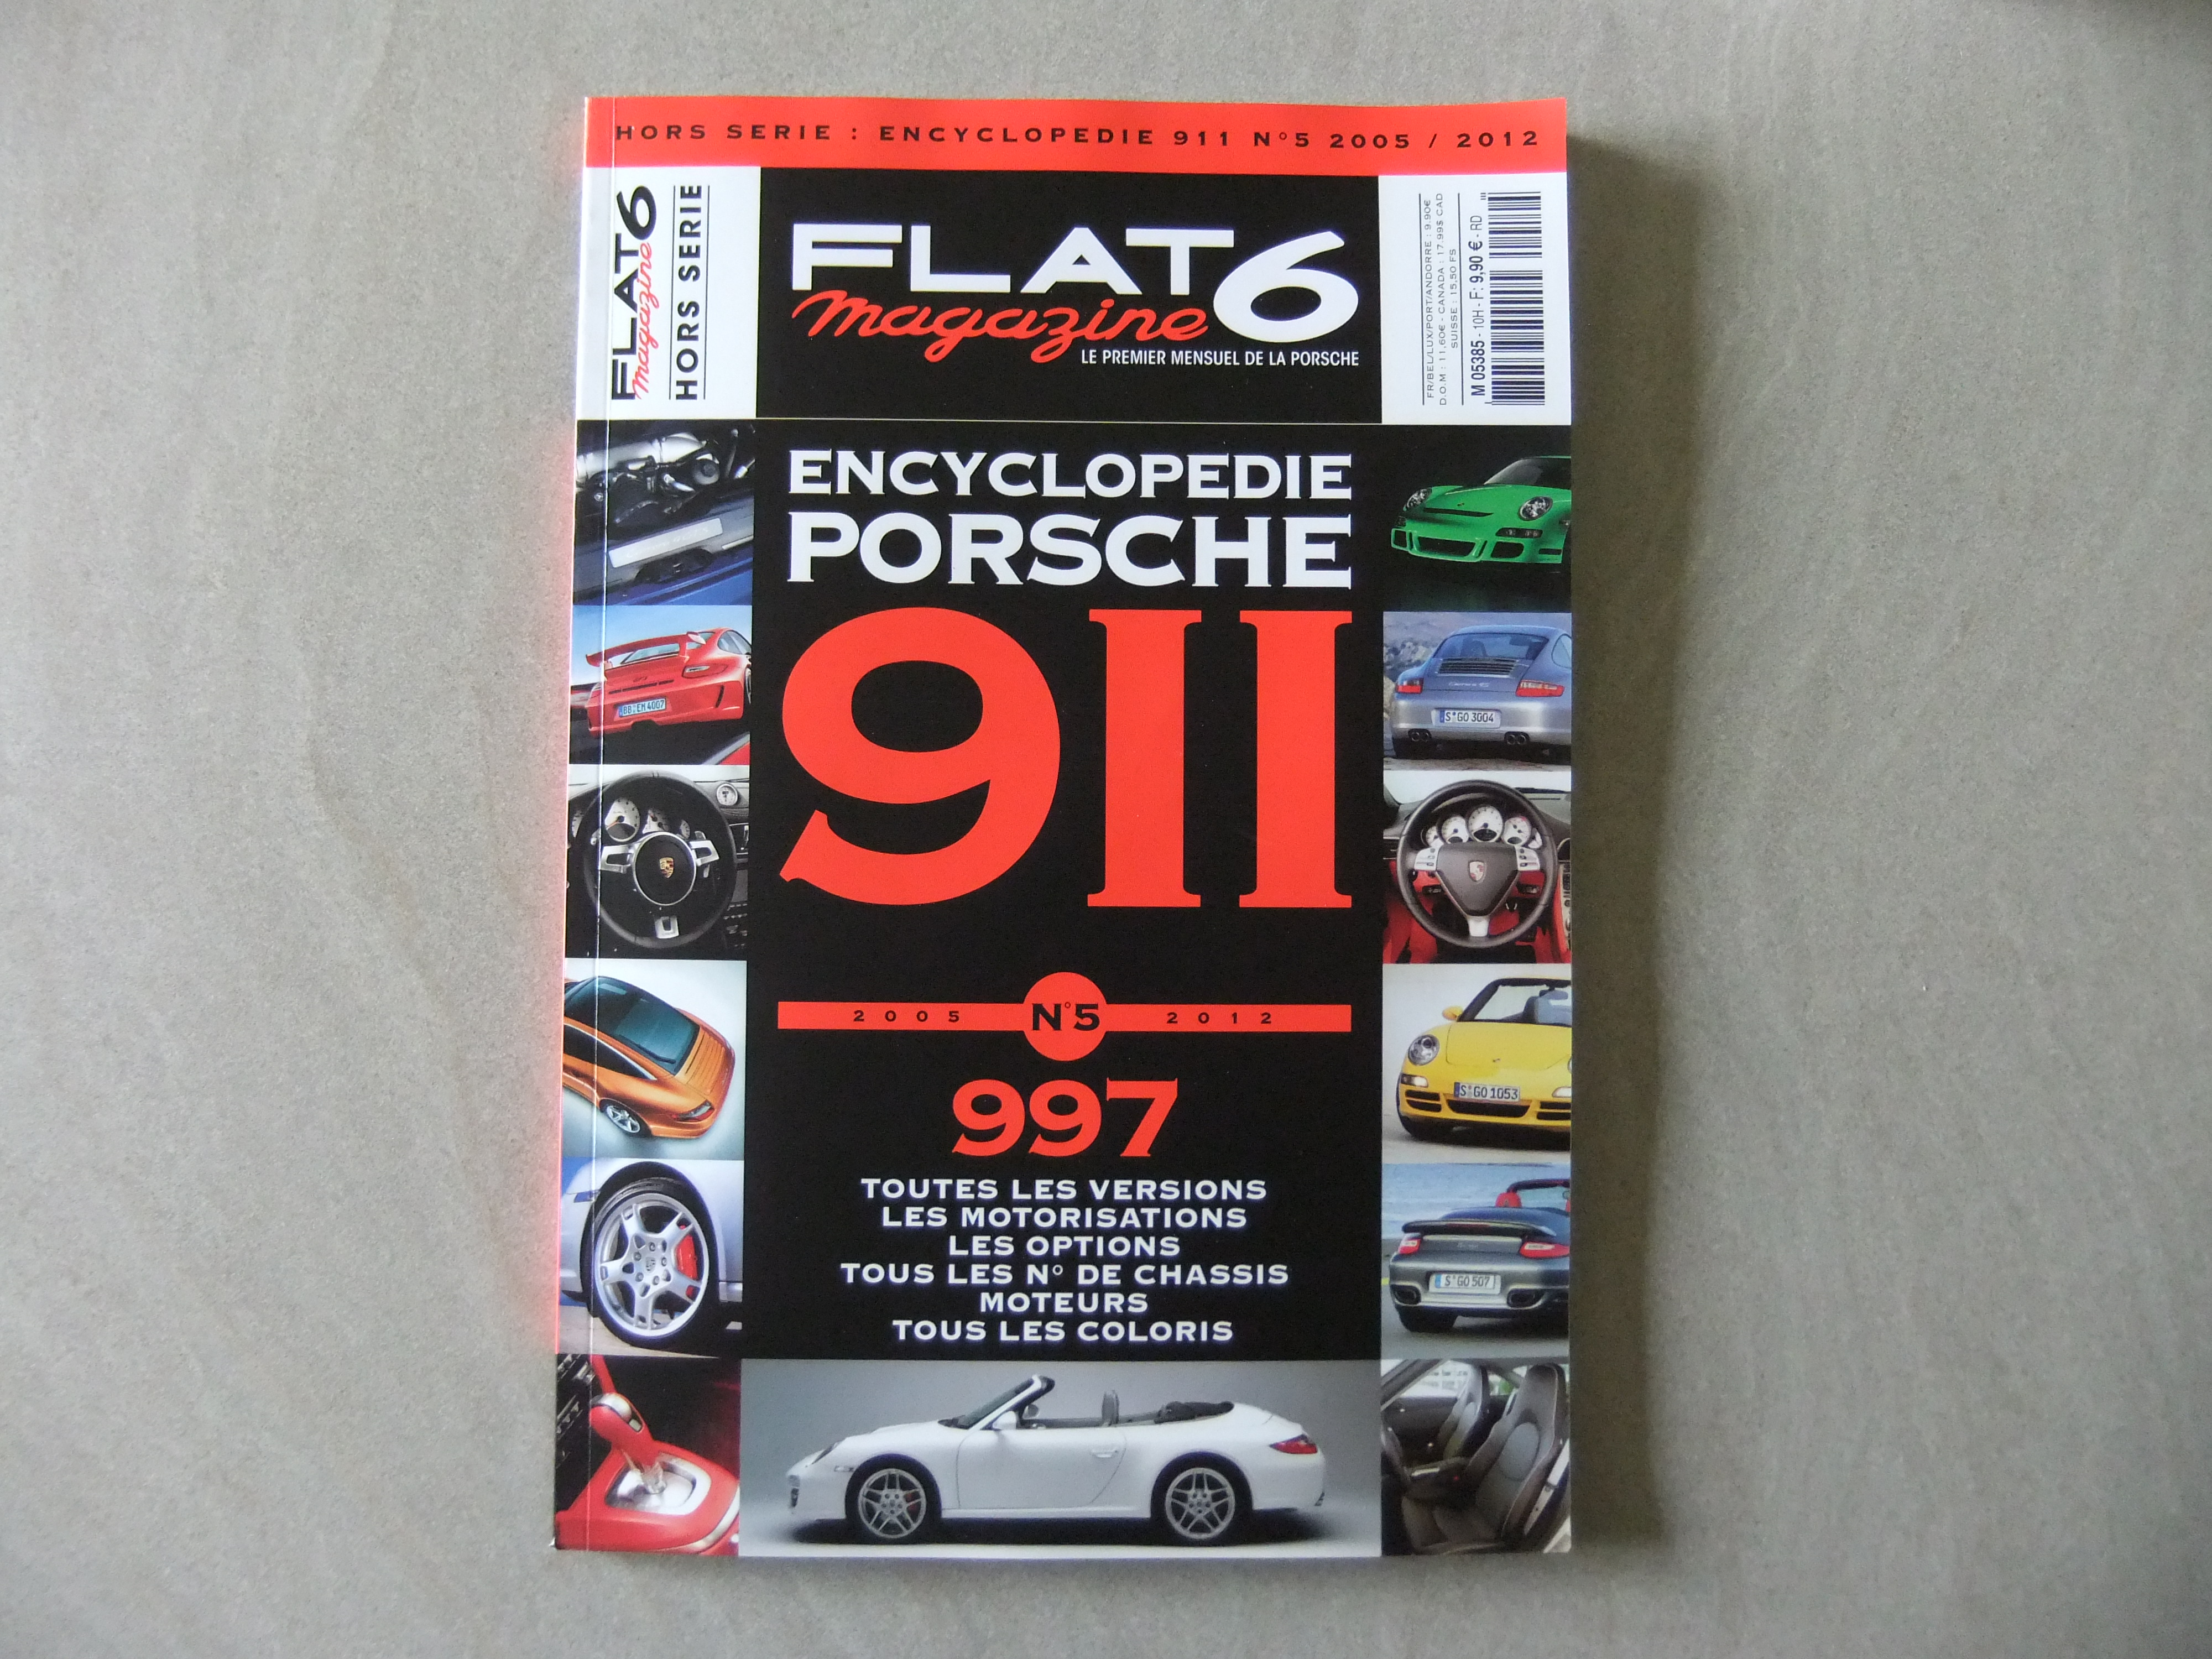 Hors Serie Encyclopedie Porsche 911 N 5 Speciale 997 Revue De